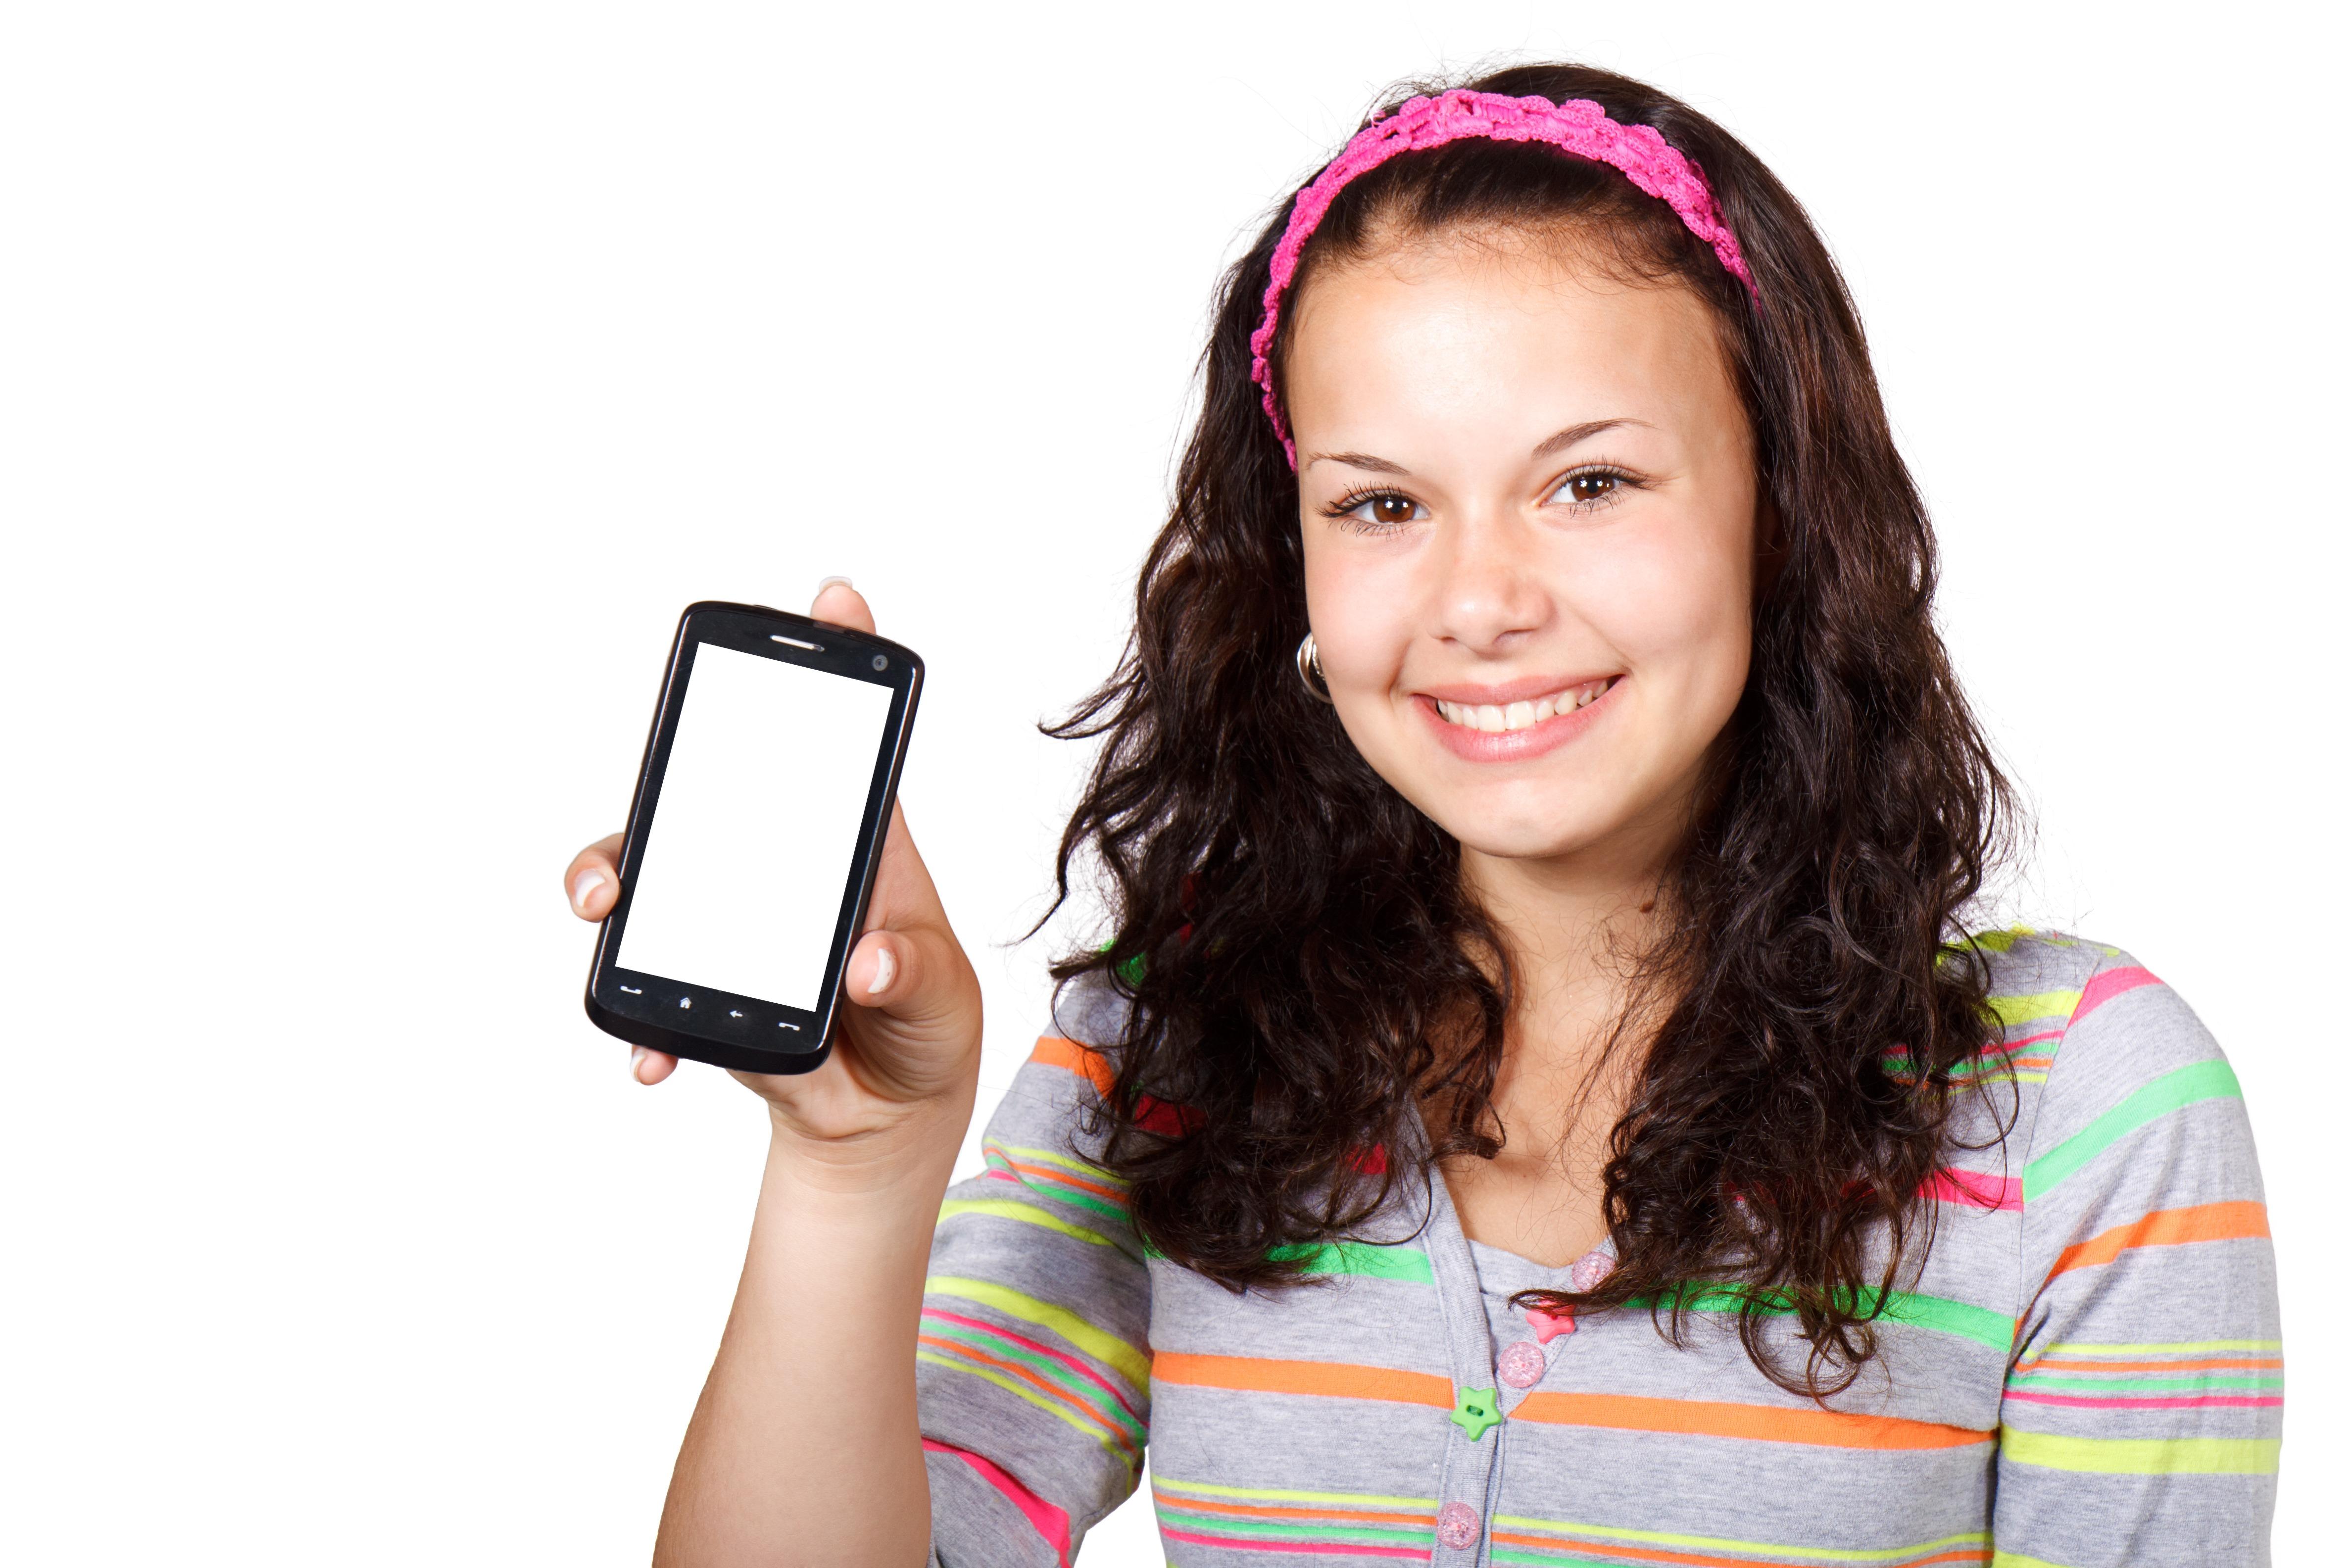 Phone_girl.jpeg